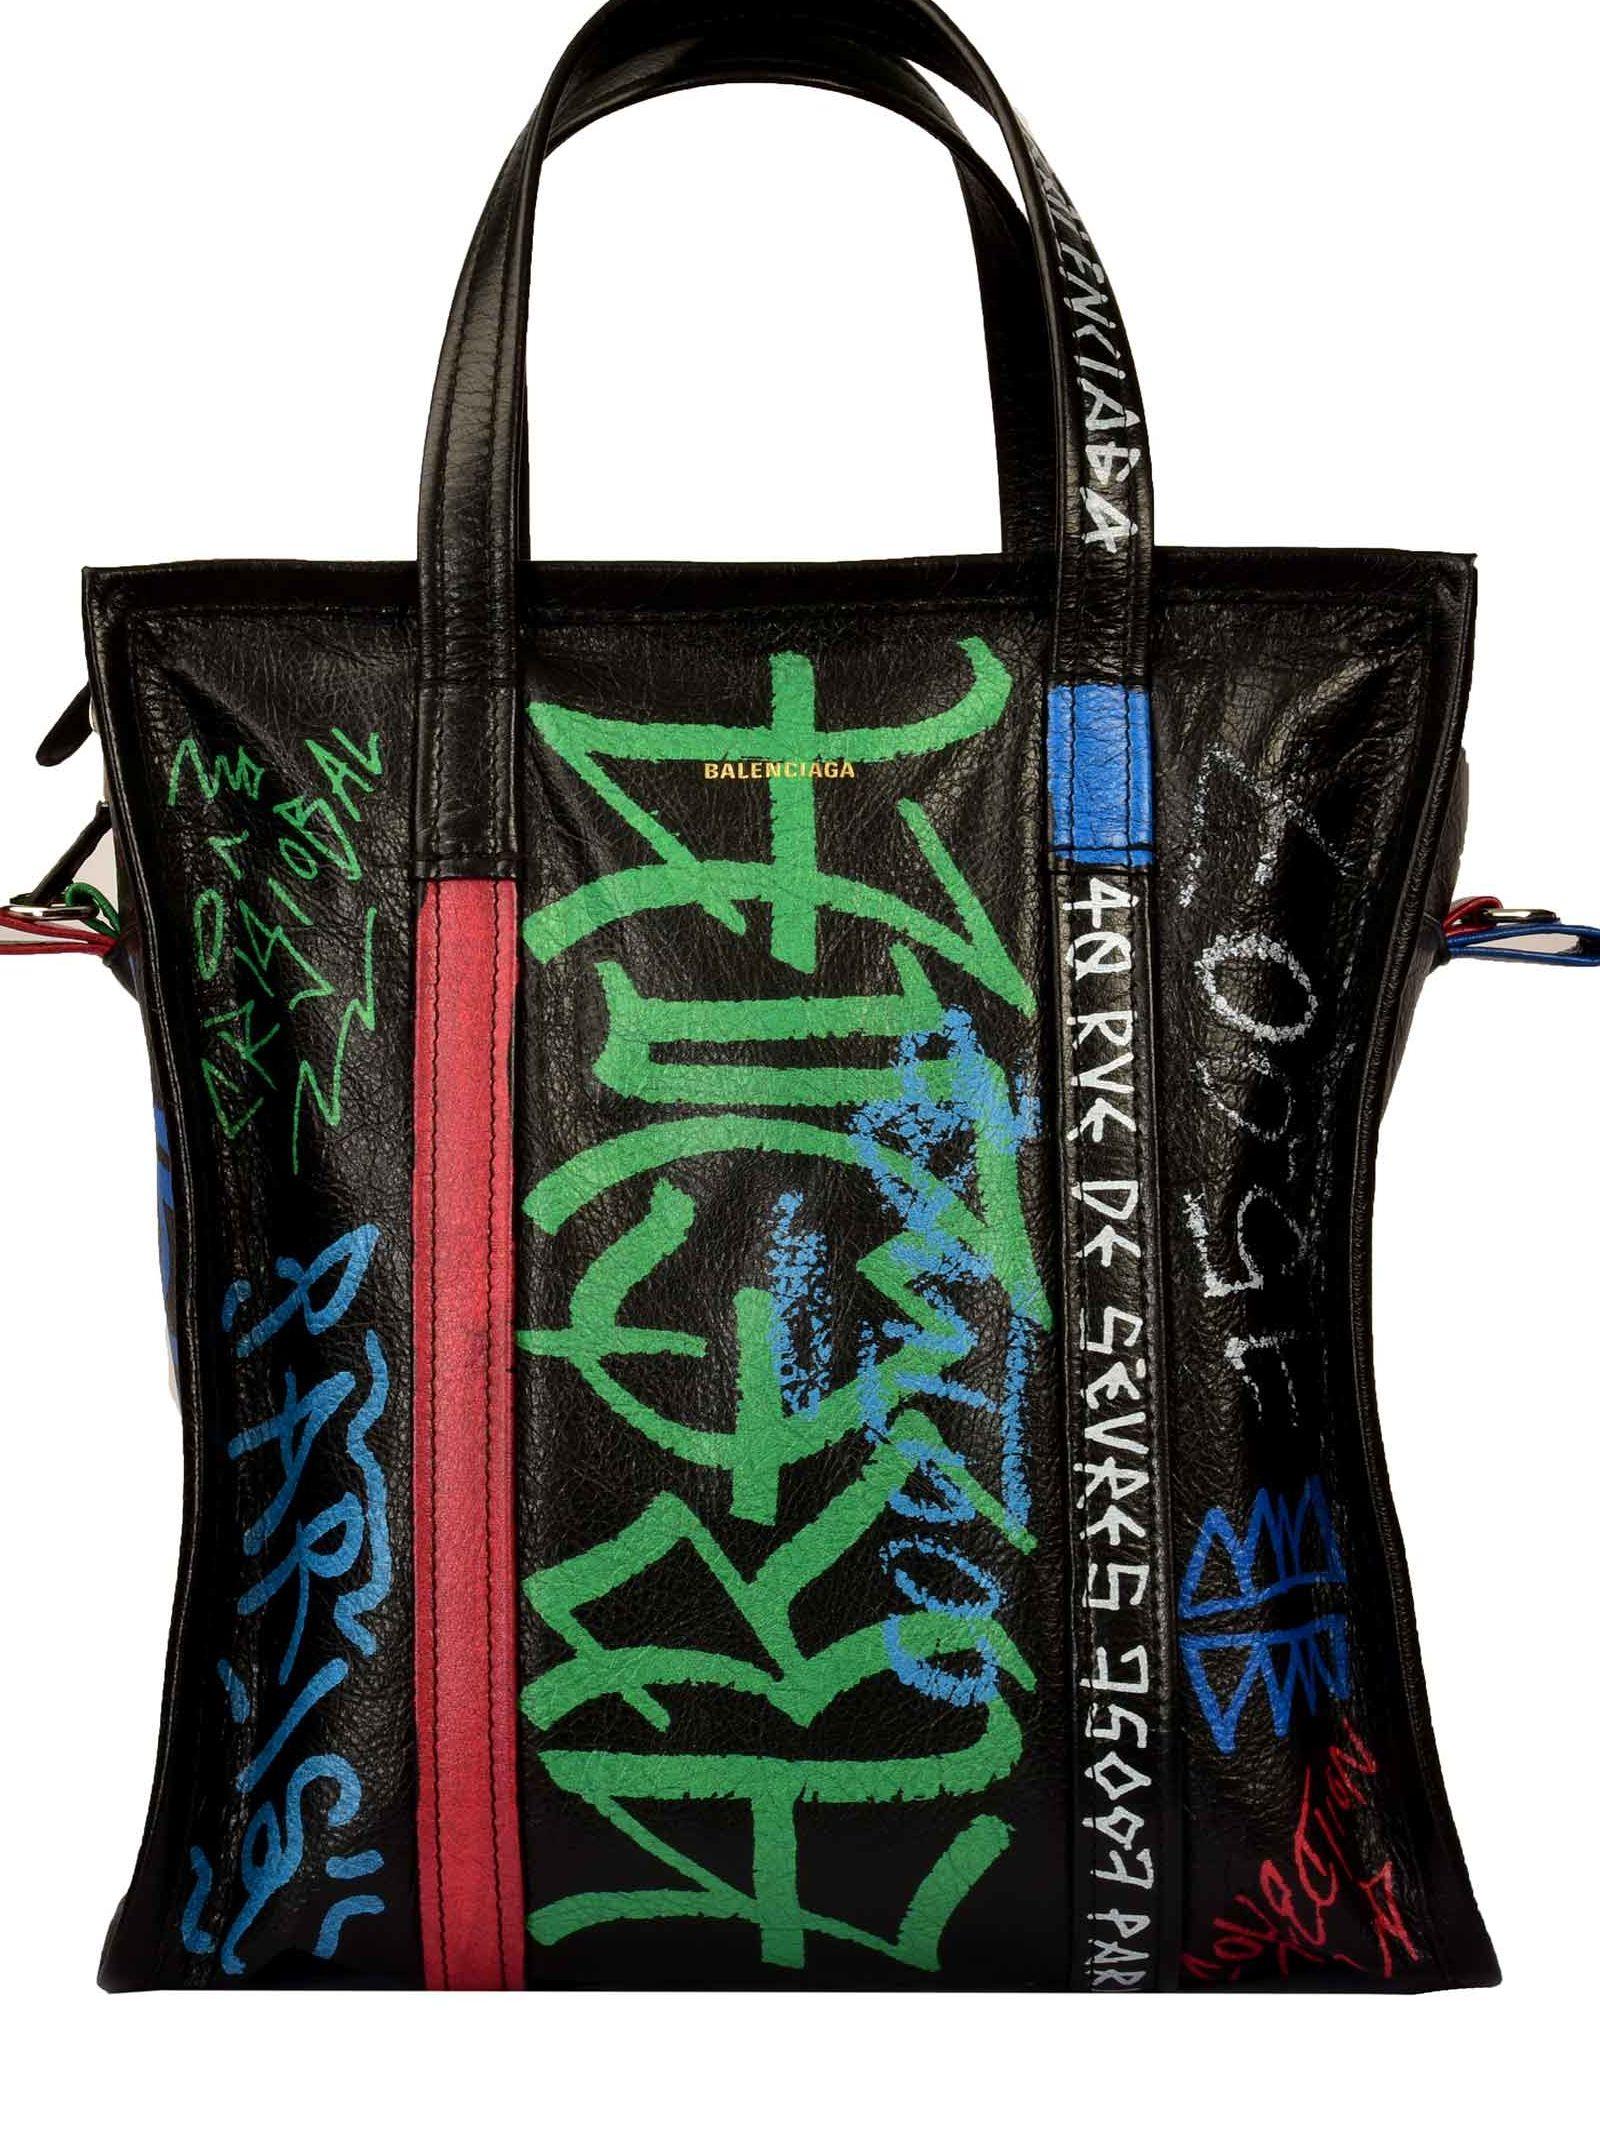 BAZAR S GRAFFITI SHOPPER BAG